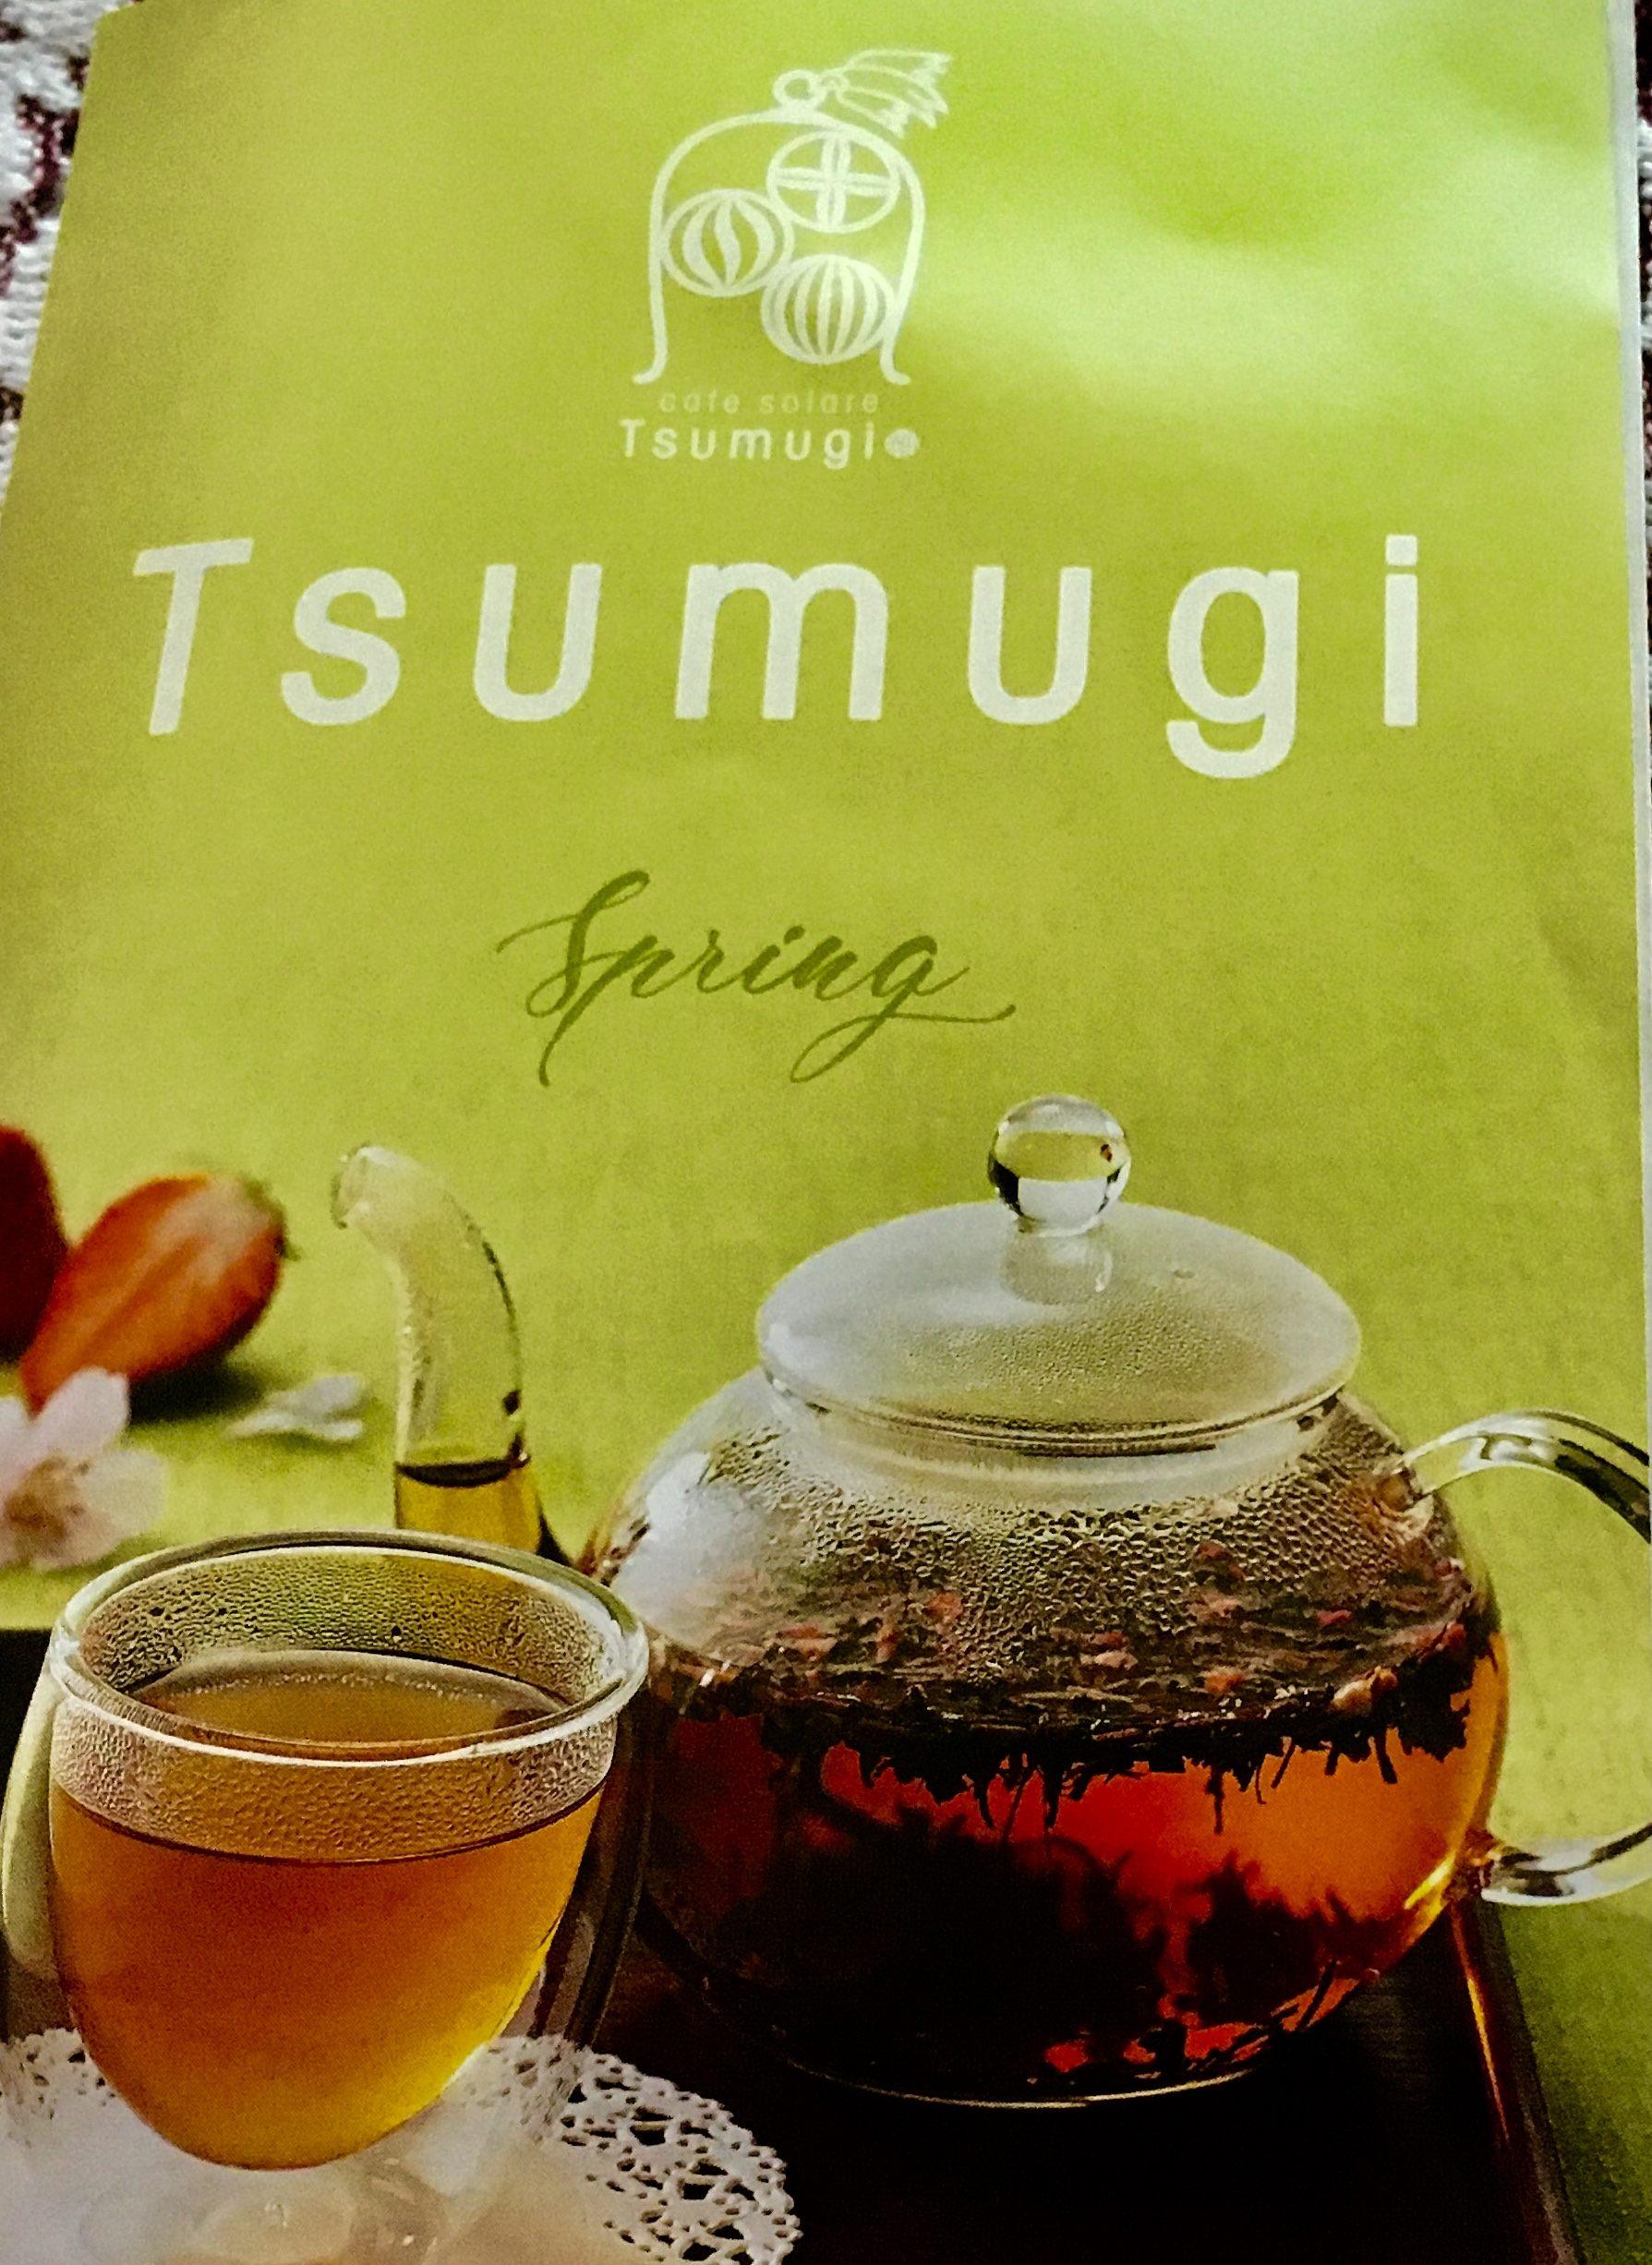 和式咖啡餐厅Tsumugi